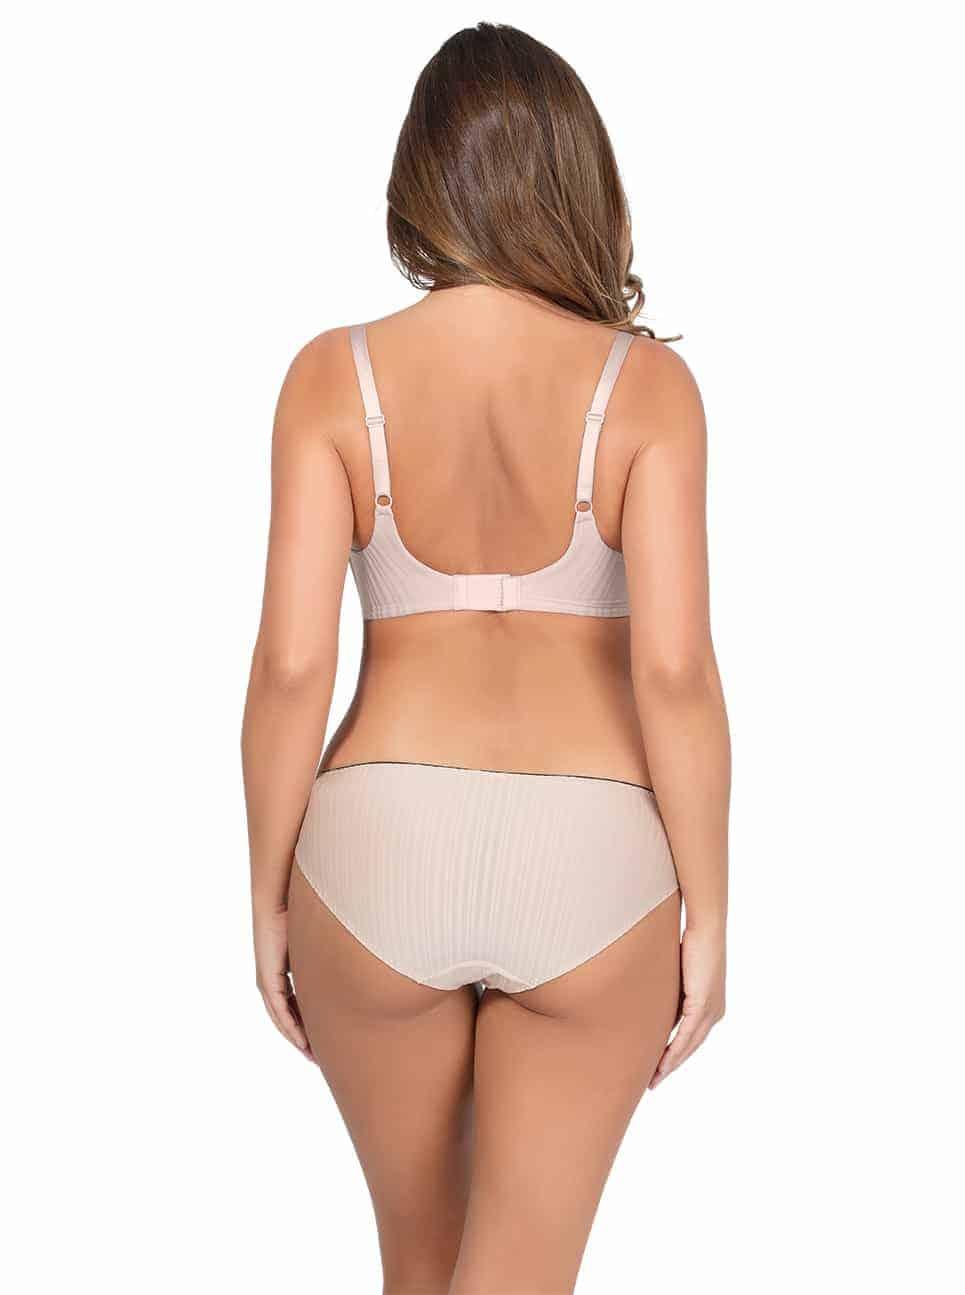 PARFAIT Aline Wire FreePaddedBraP5252 BikiniP5253 Nude Back - Aline Wire-Free Padded Bra - Nude - P5252